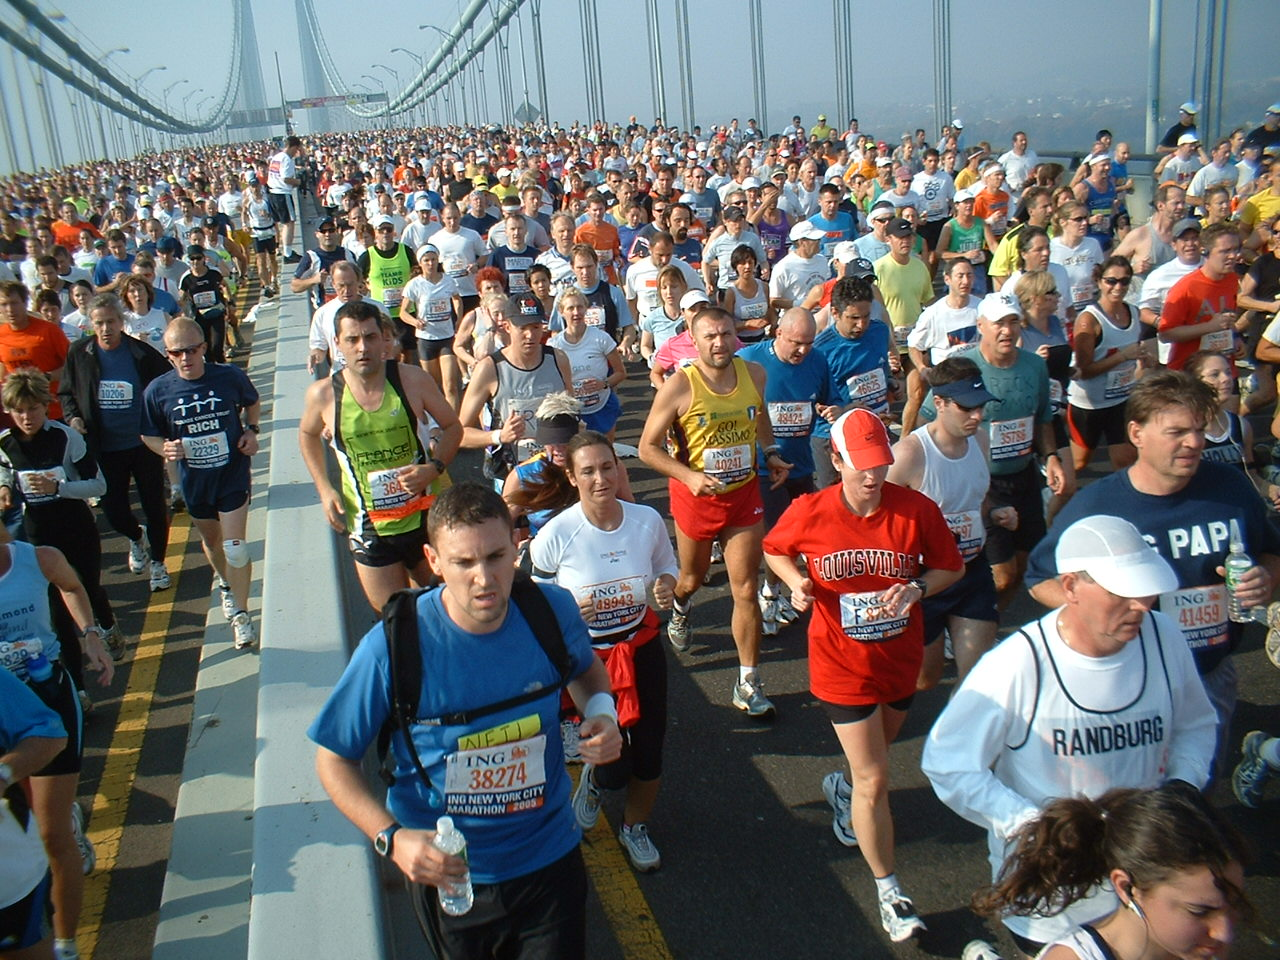 New_York_marathon_Verrazano_bridge